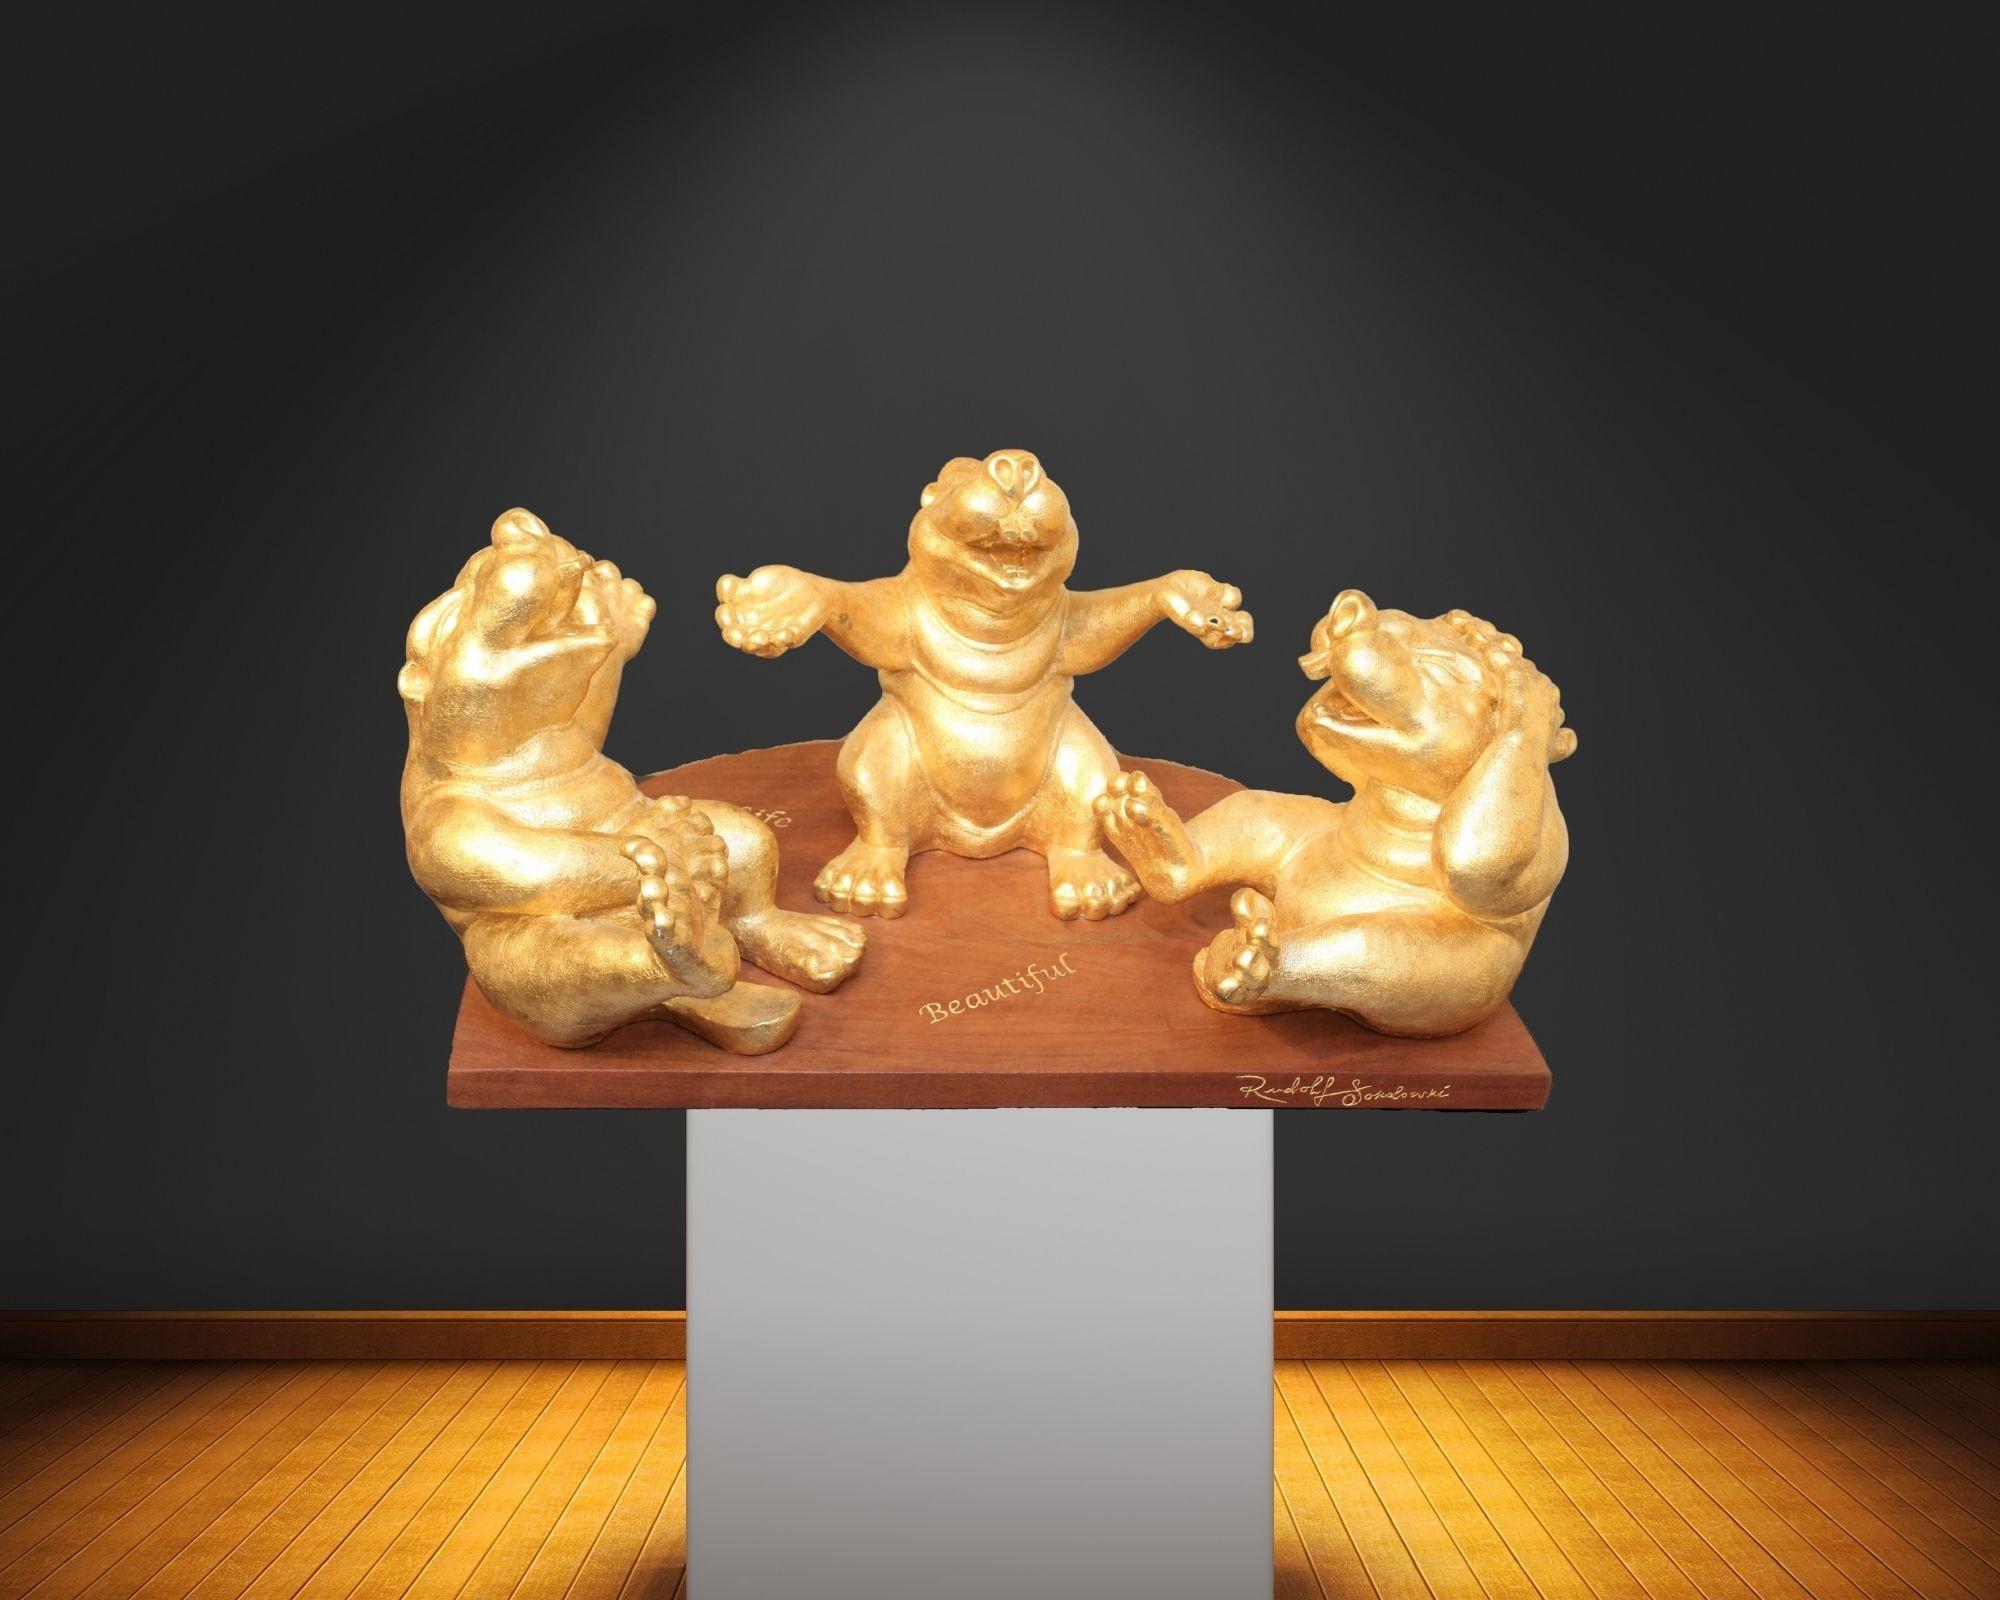 Rudolf Sokolovski Life Is Beautiful Sculpture